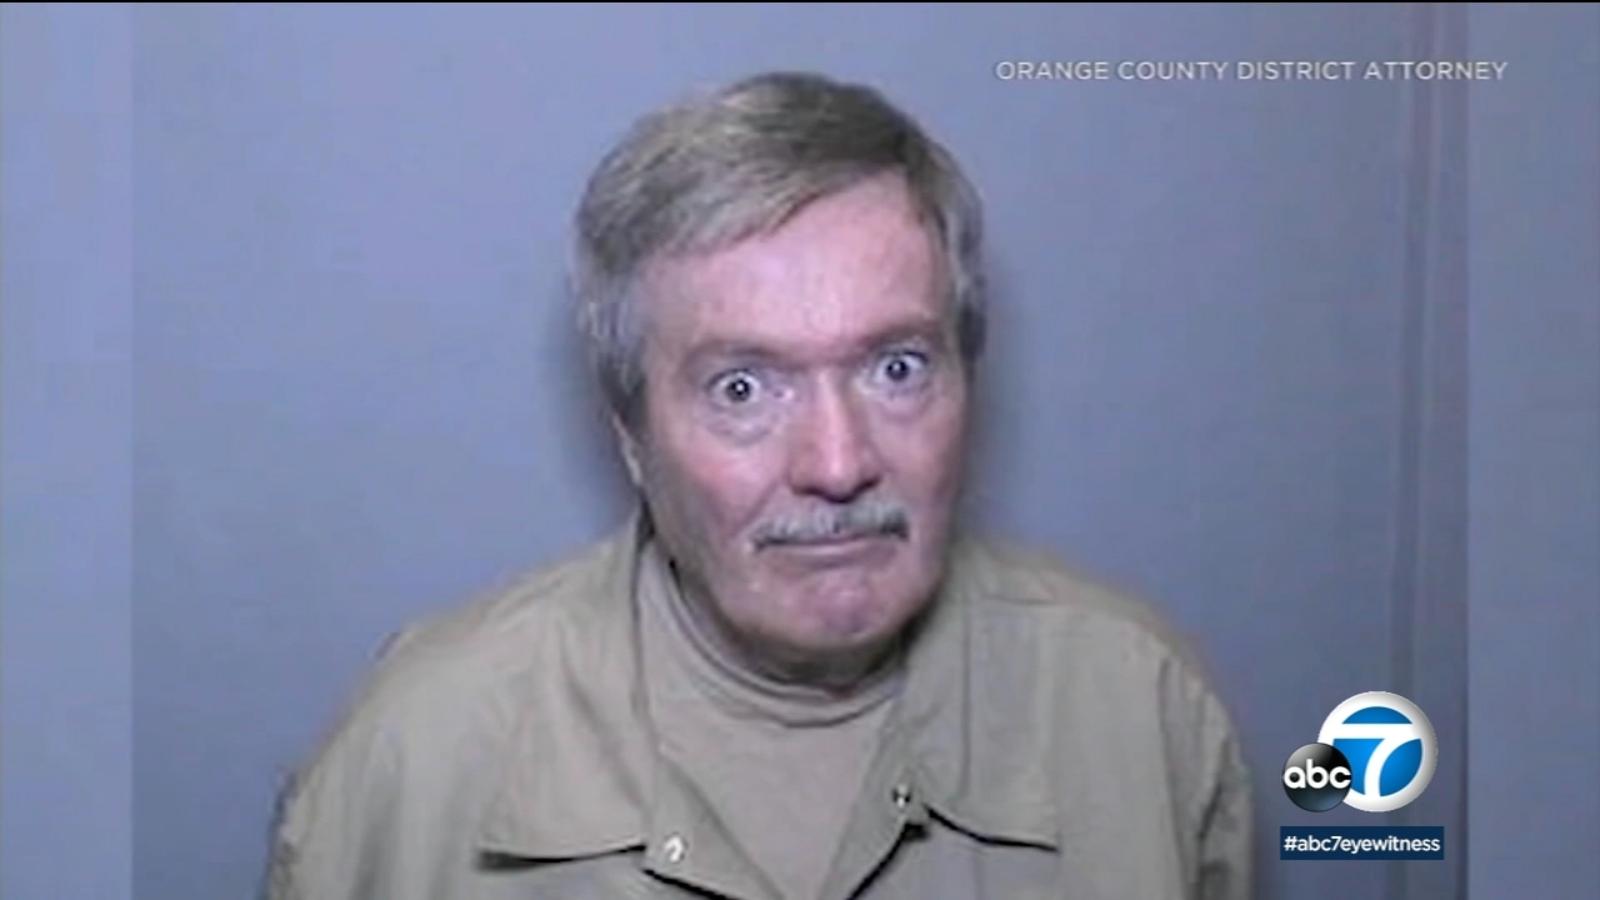 mcelvane sex offender california in Costa Mesa